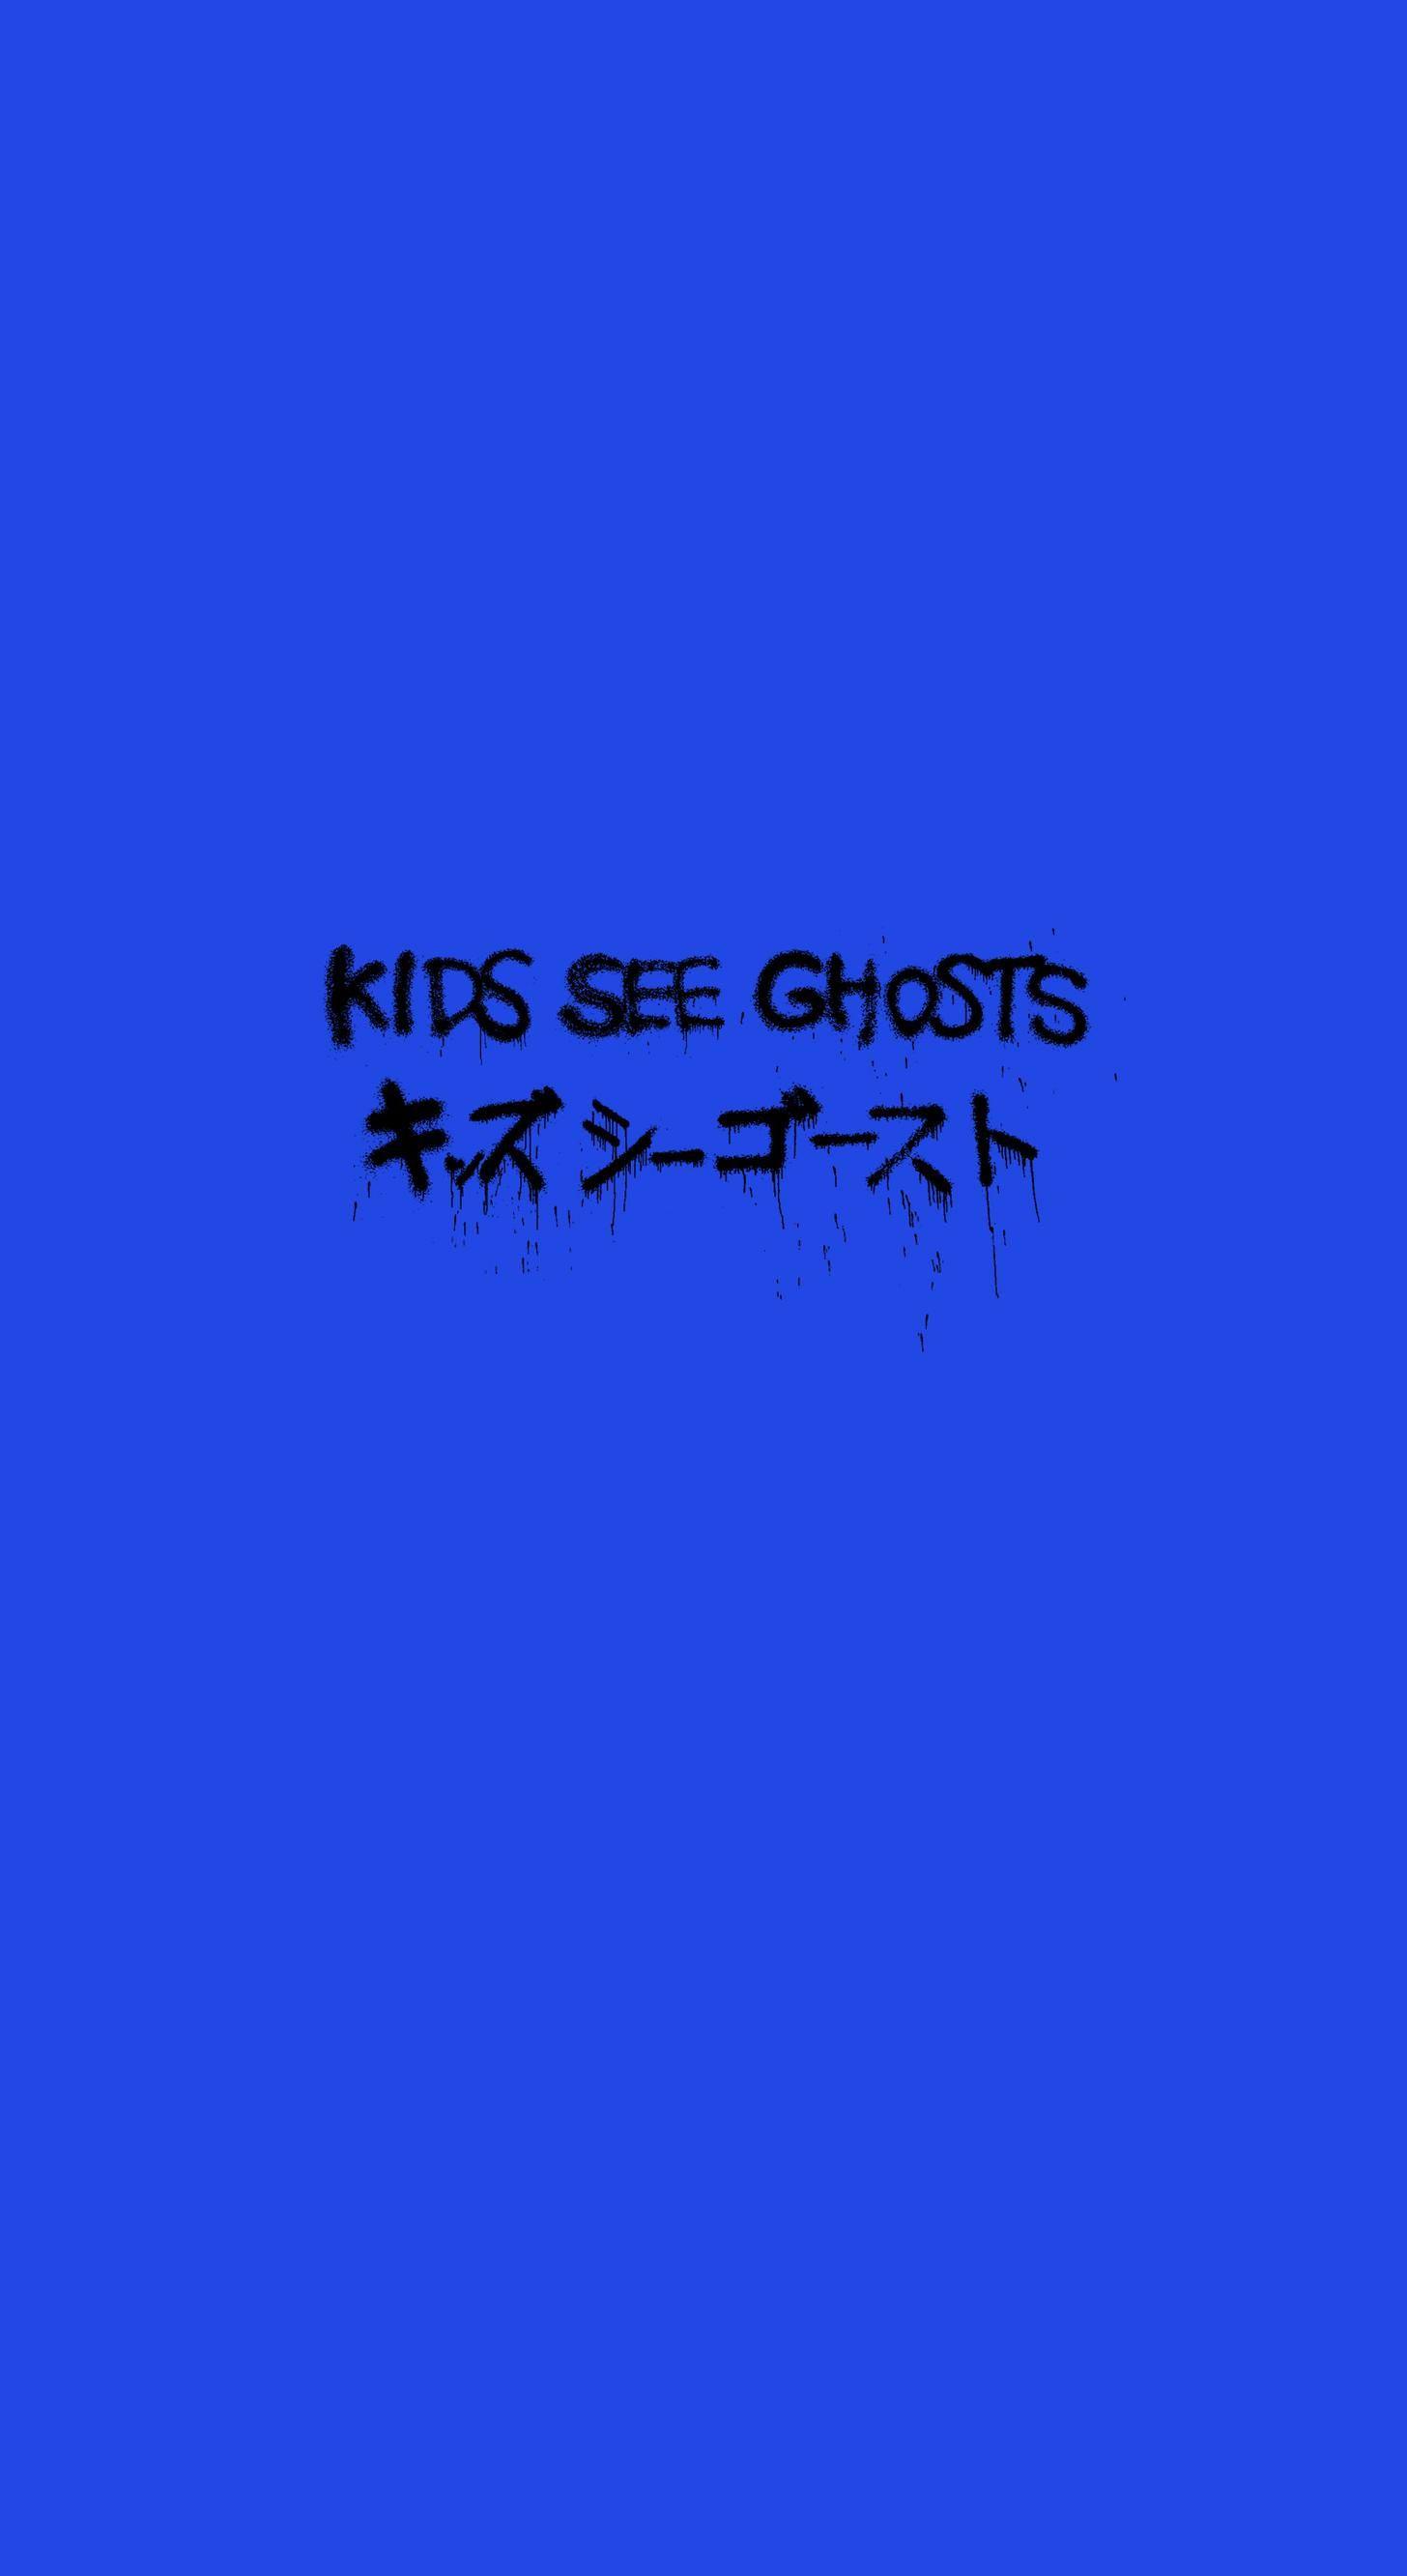 Kids See Ghosts Kanye Iphone Wallpaper Yeezus Wallpaper